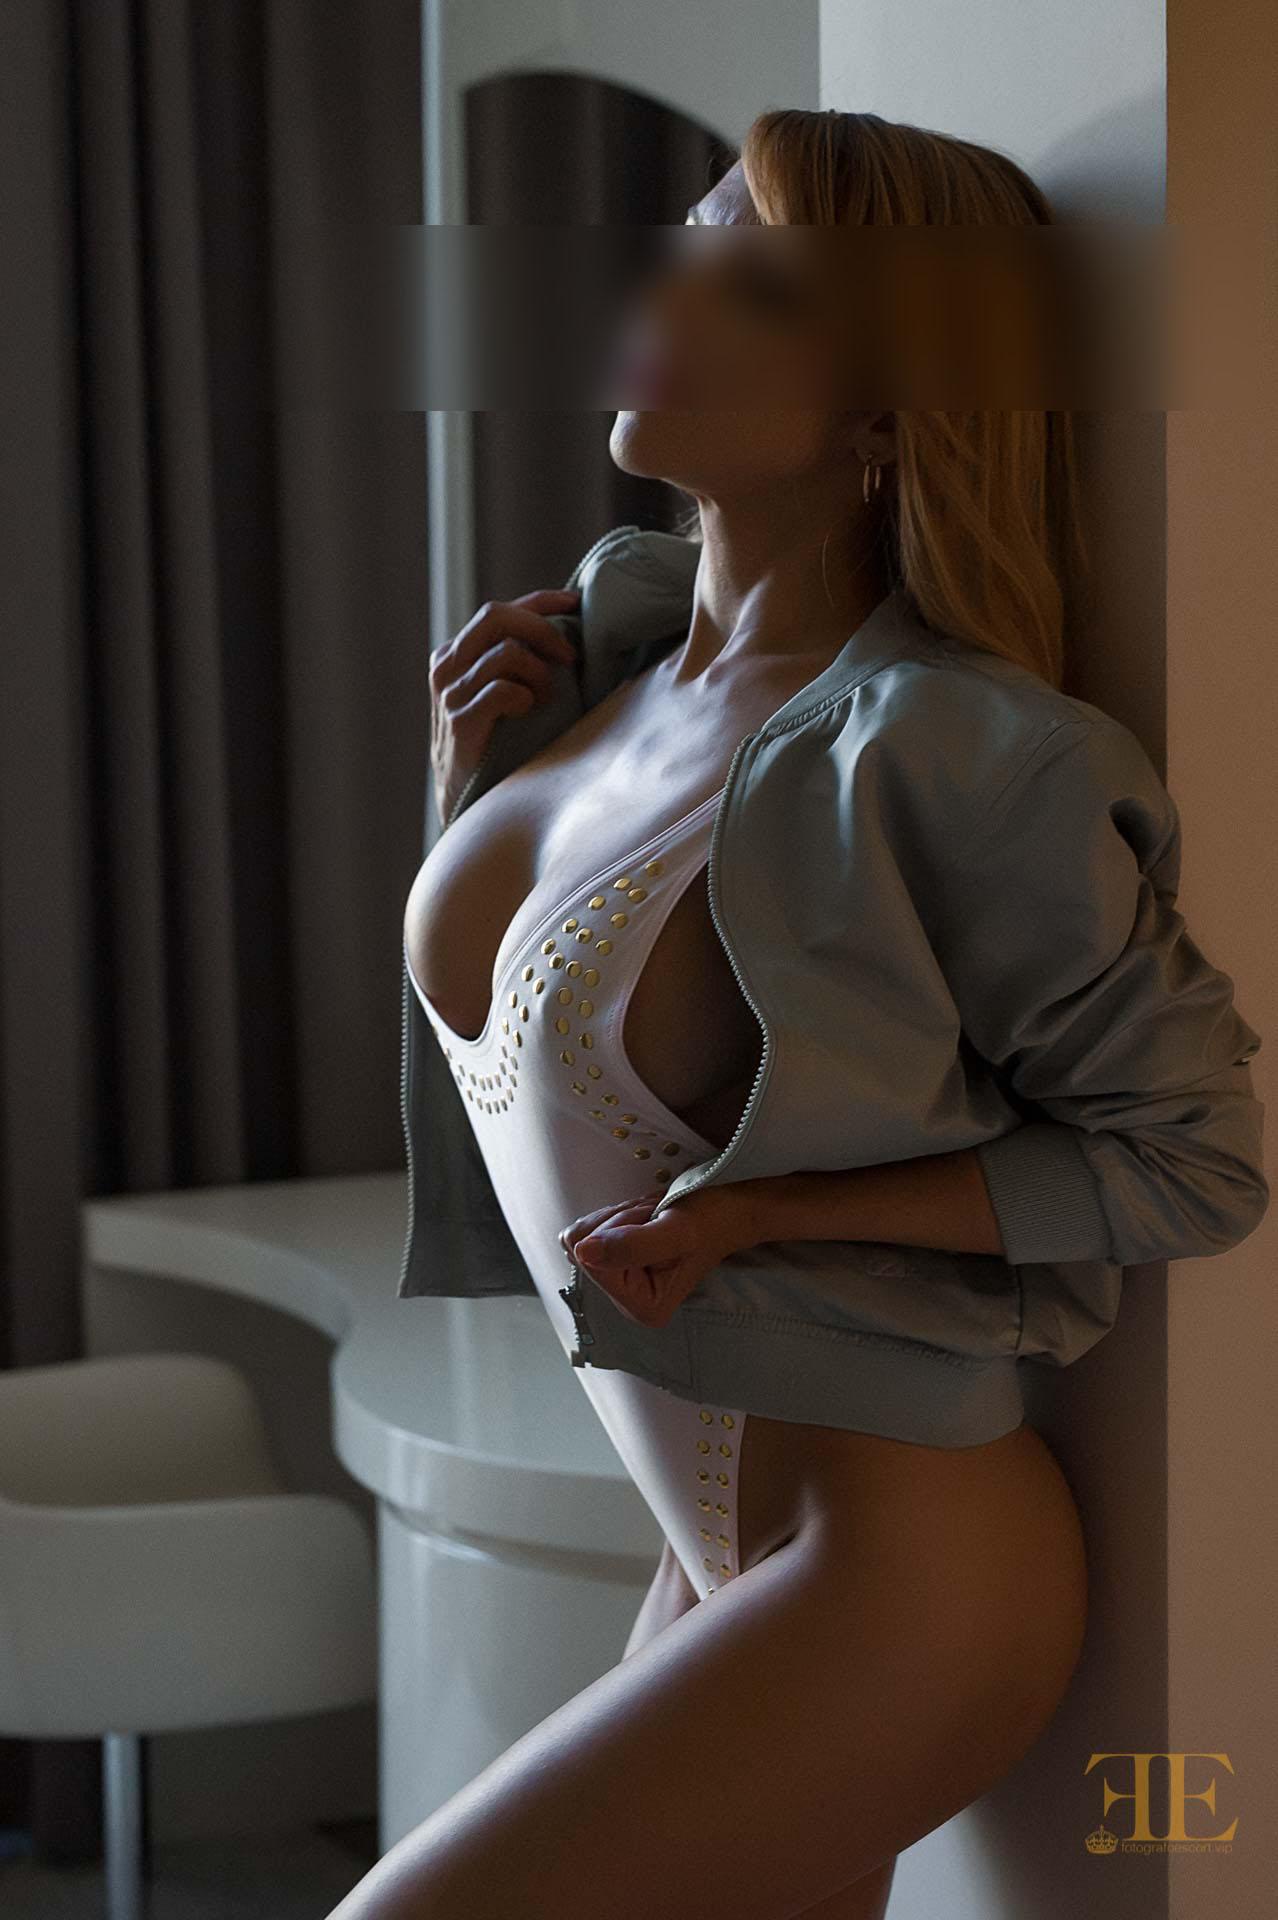 Fotografo erotico para escort 016